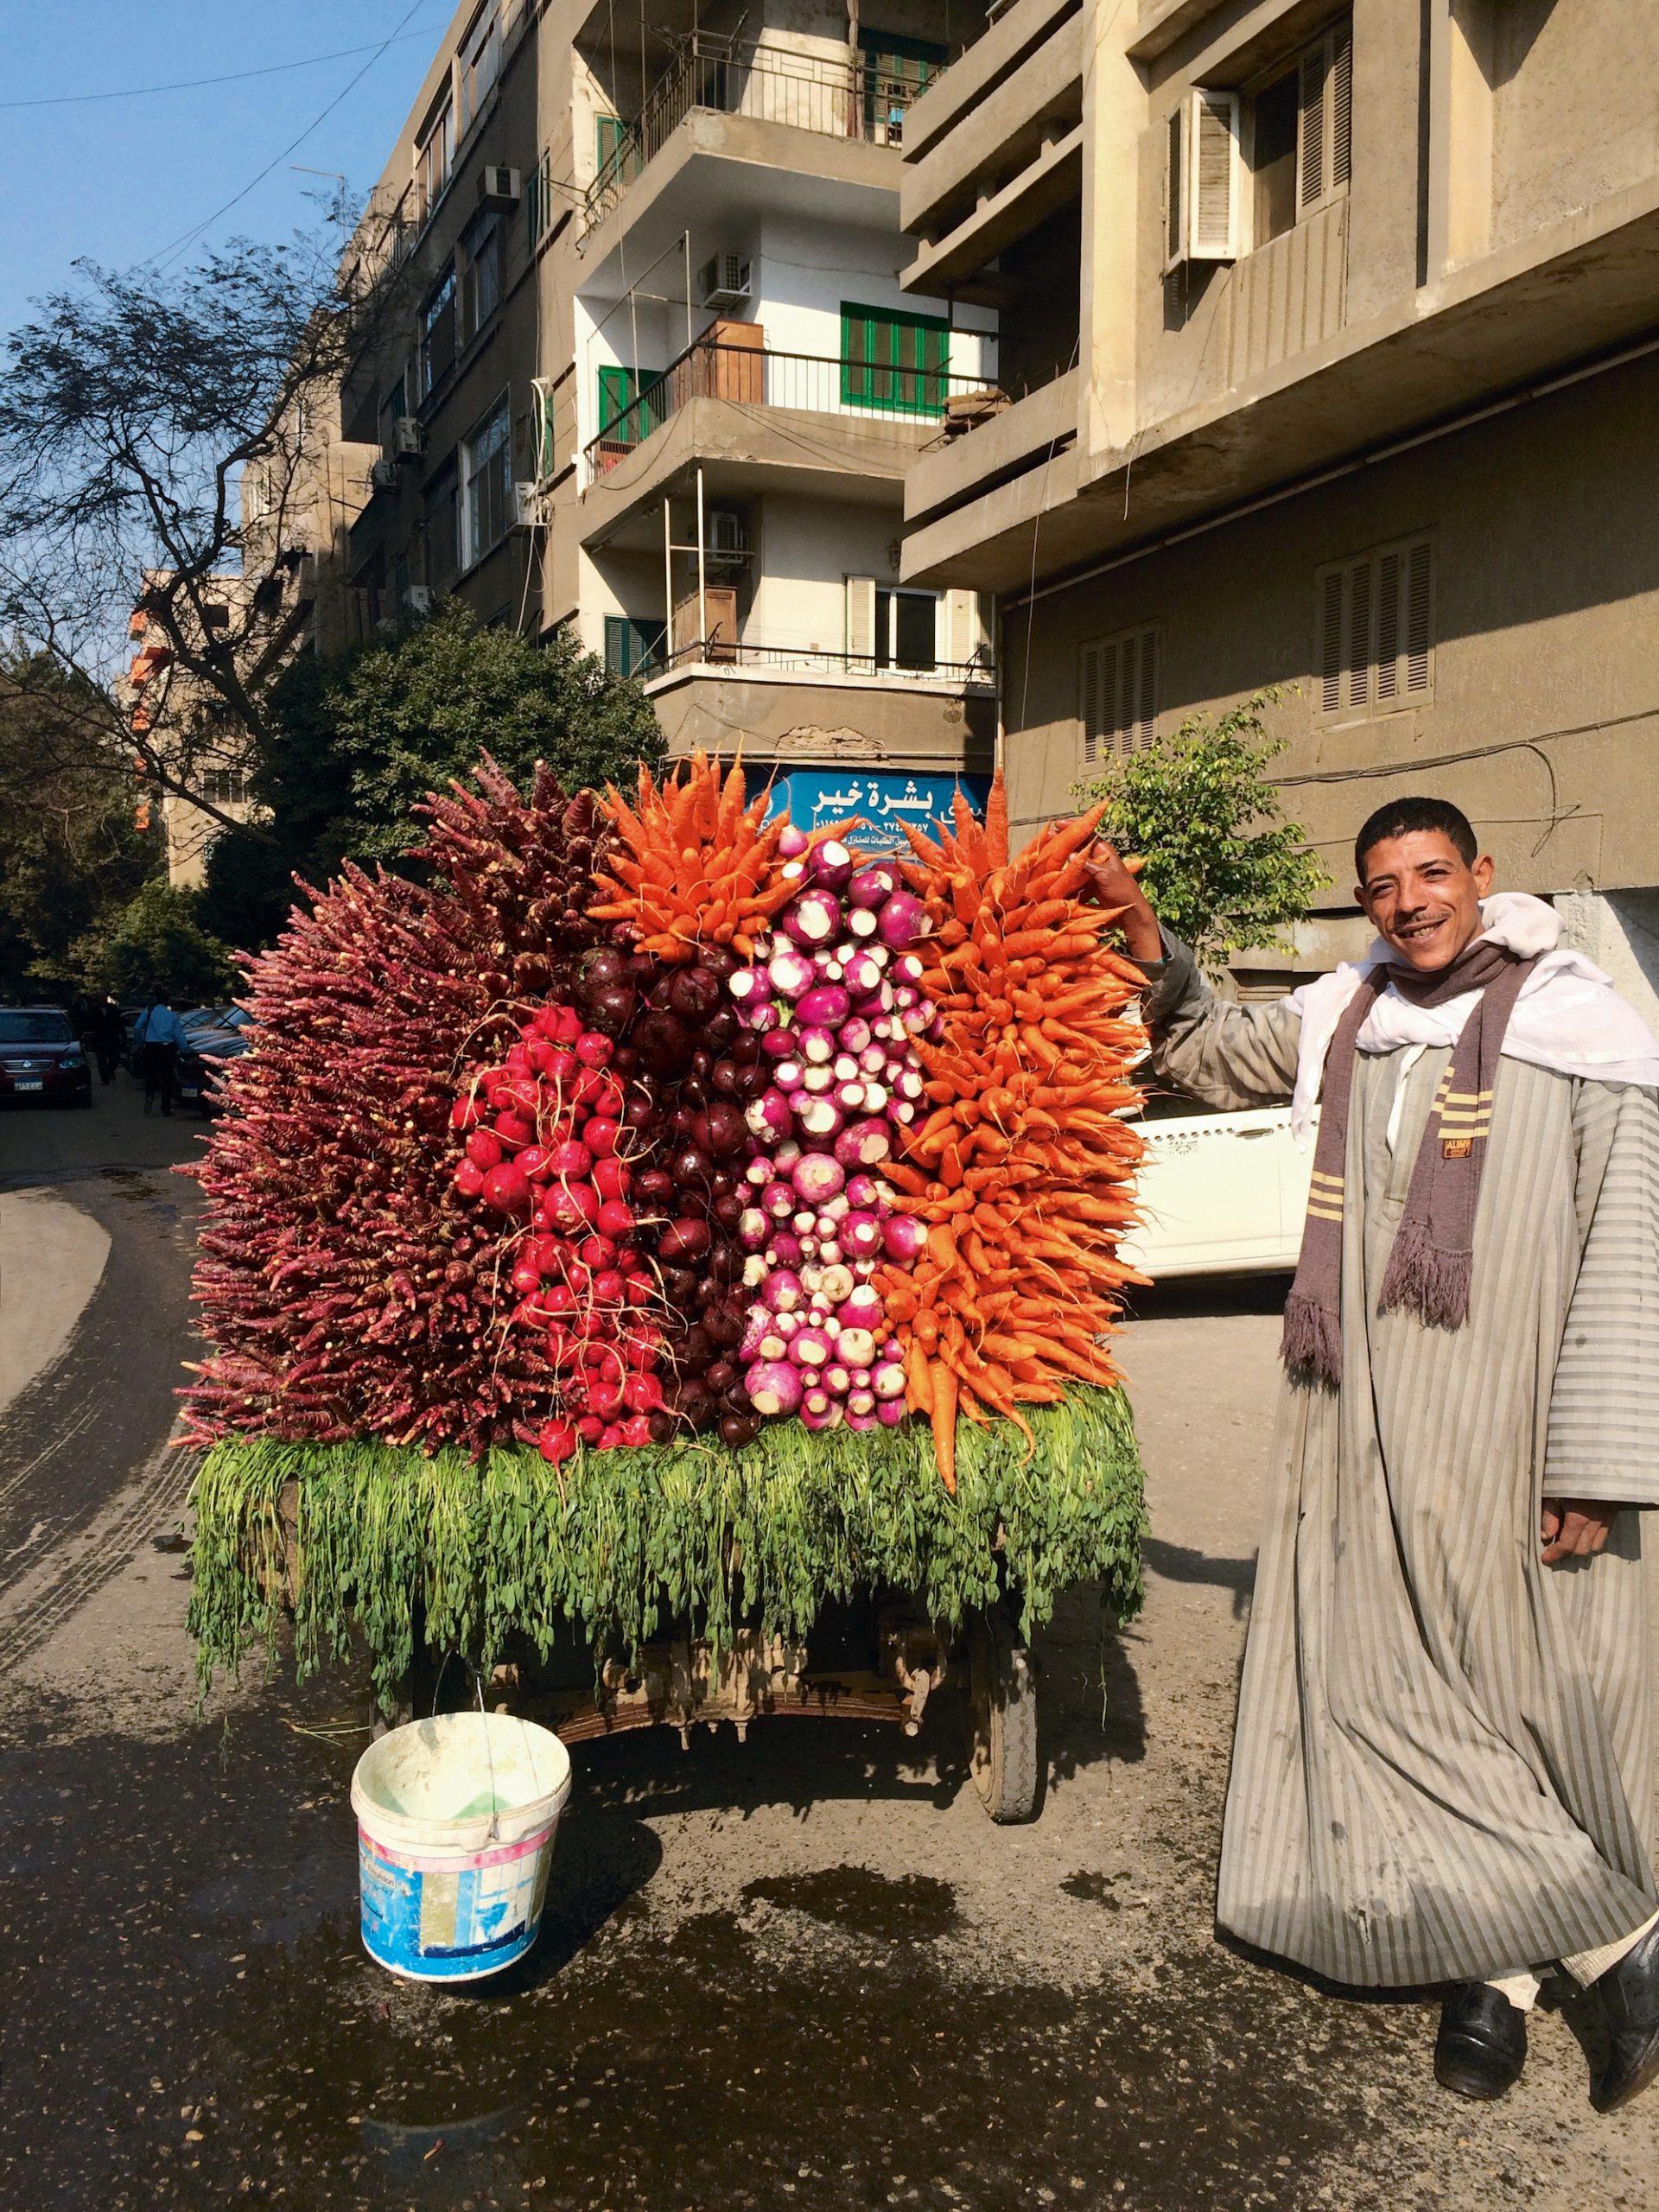 Ghada Amer. Mama's Eggplant Salad. Image: The Carrot Vendor, December 2018. Courtesy the artist